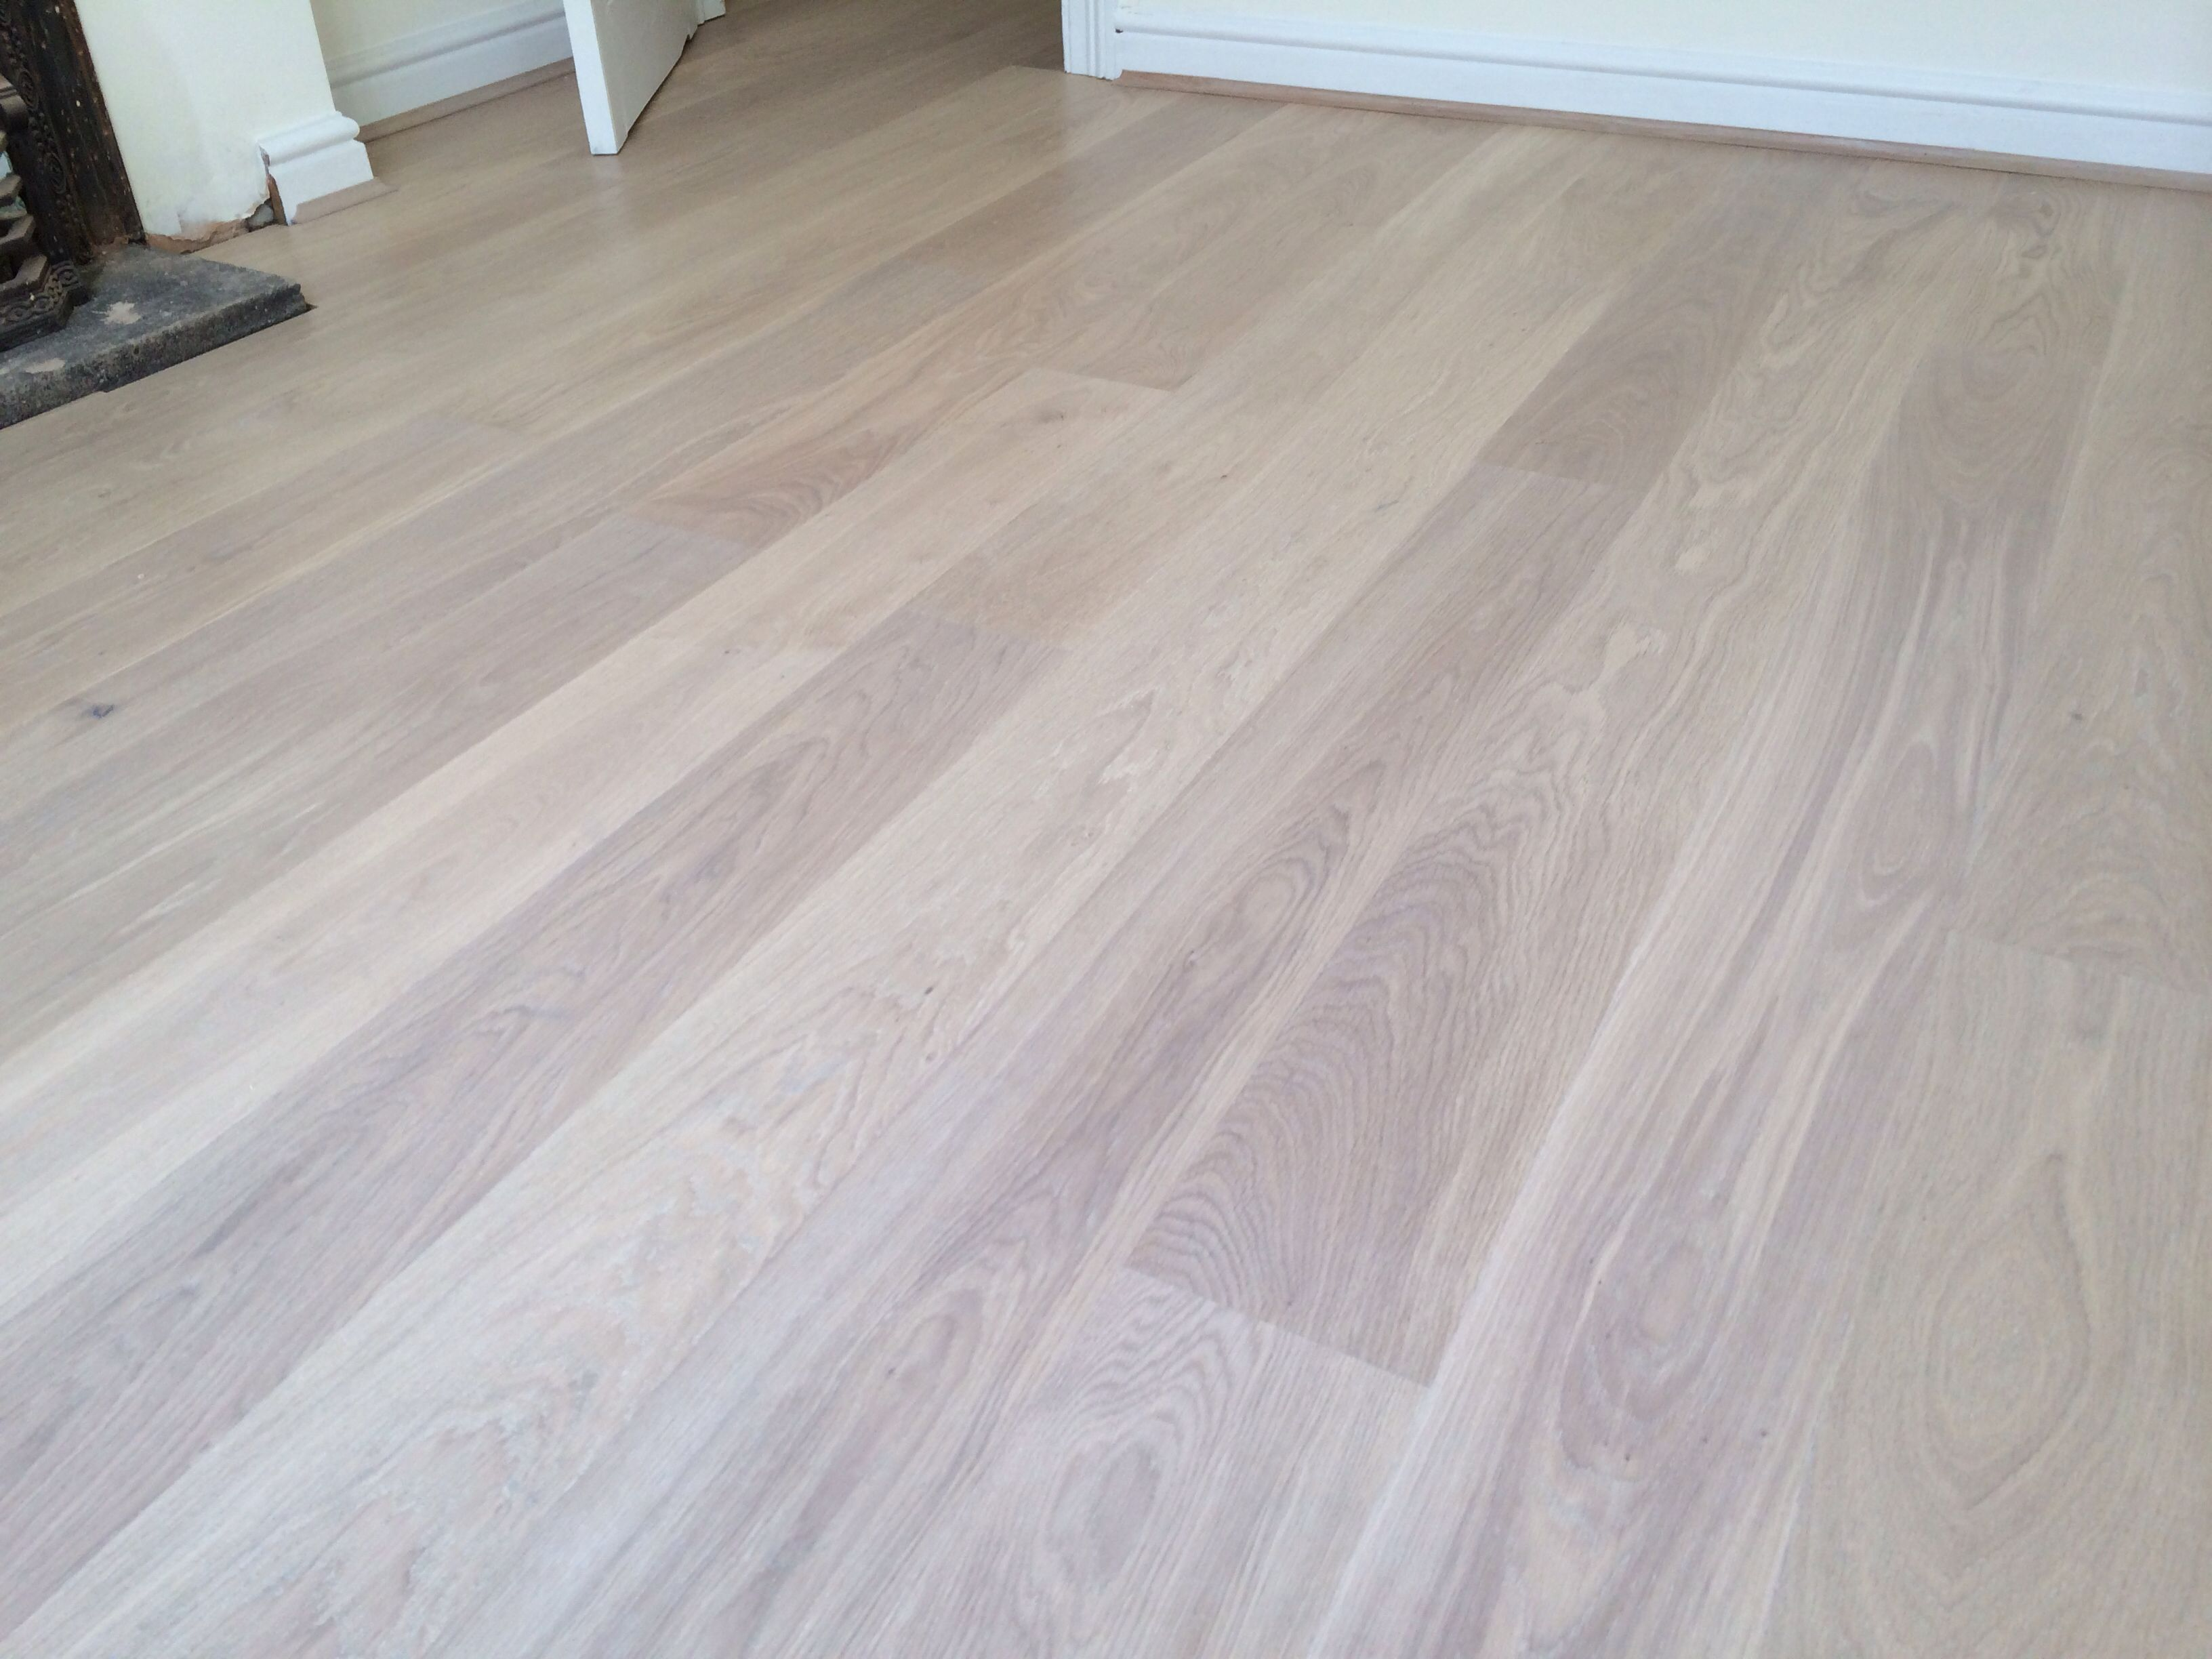 White Washed Oak Flooring Home Pinterest